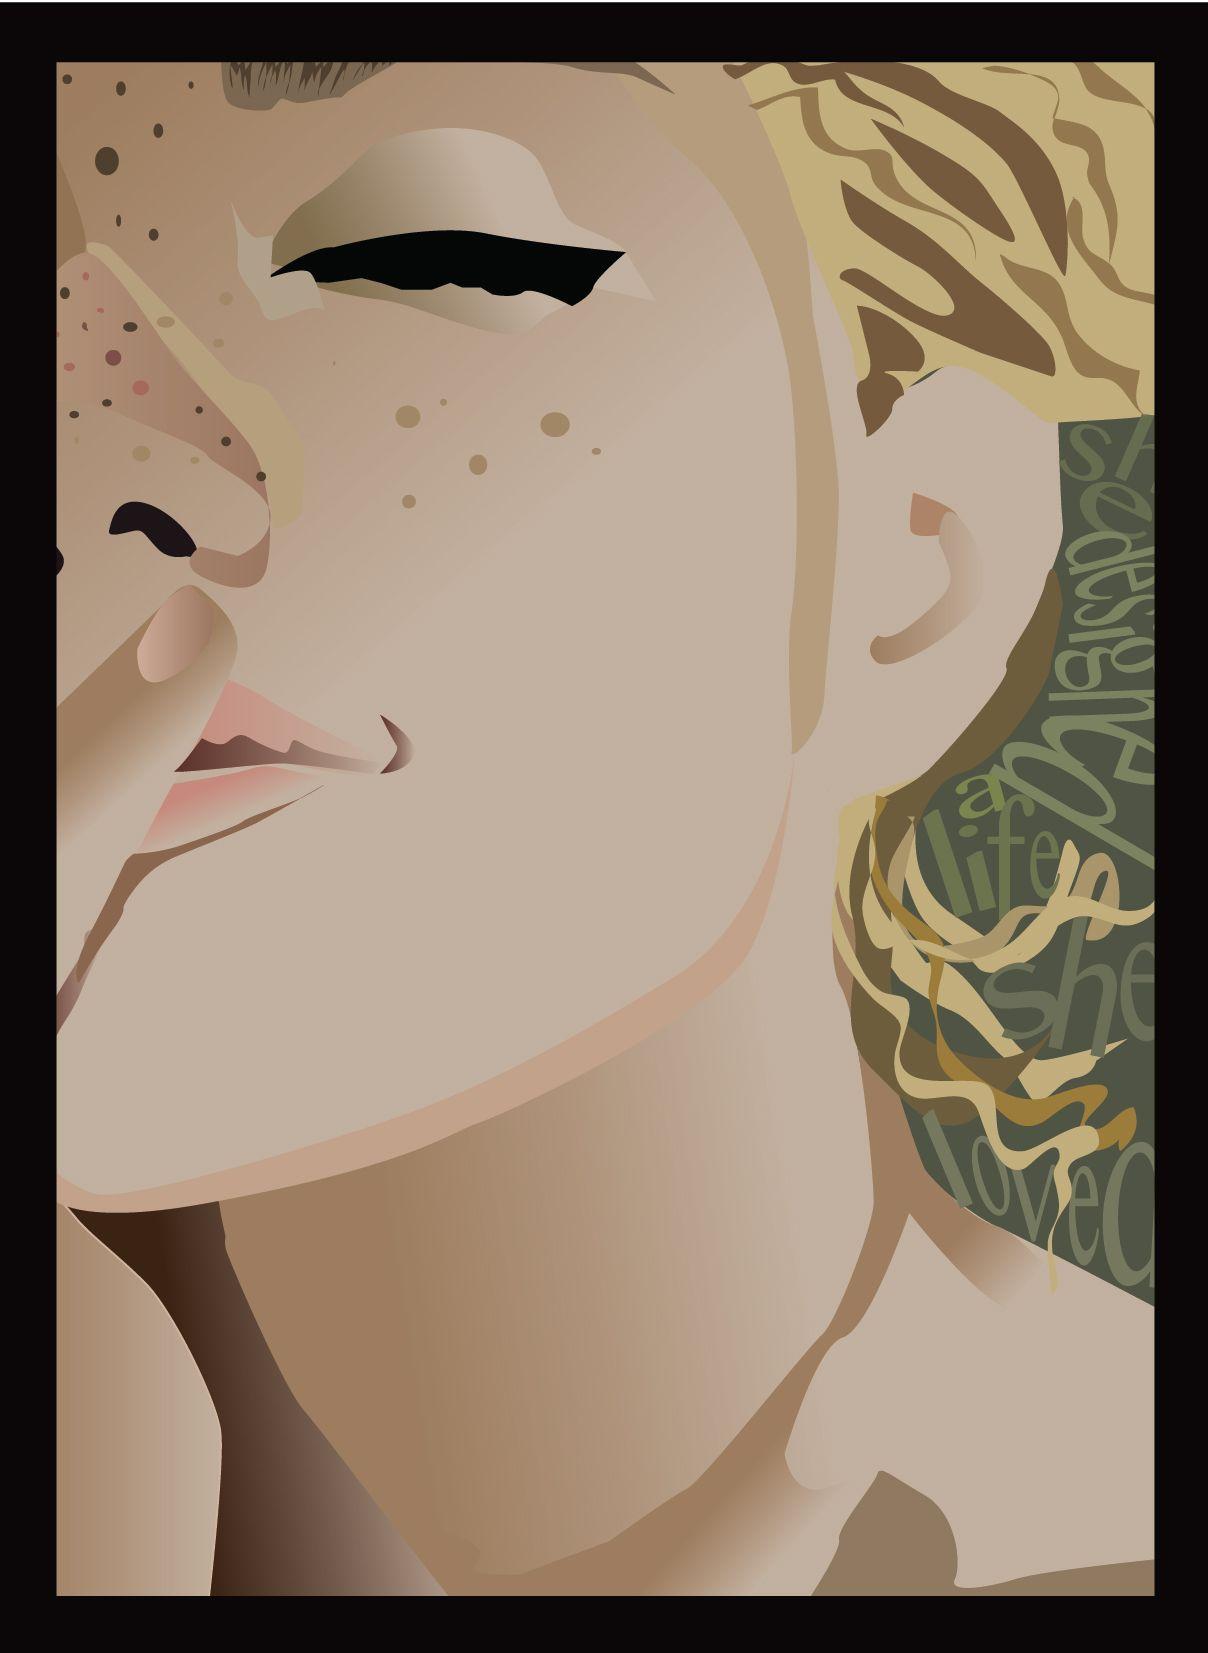 """She designed a life she loved"" original illustration by Kitt Depatie"